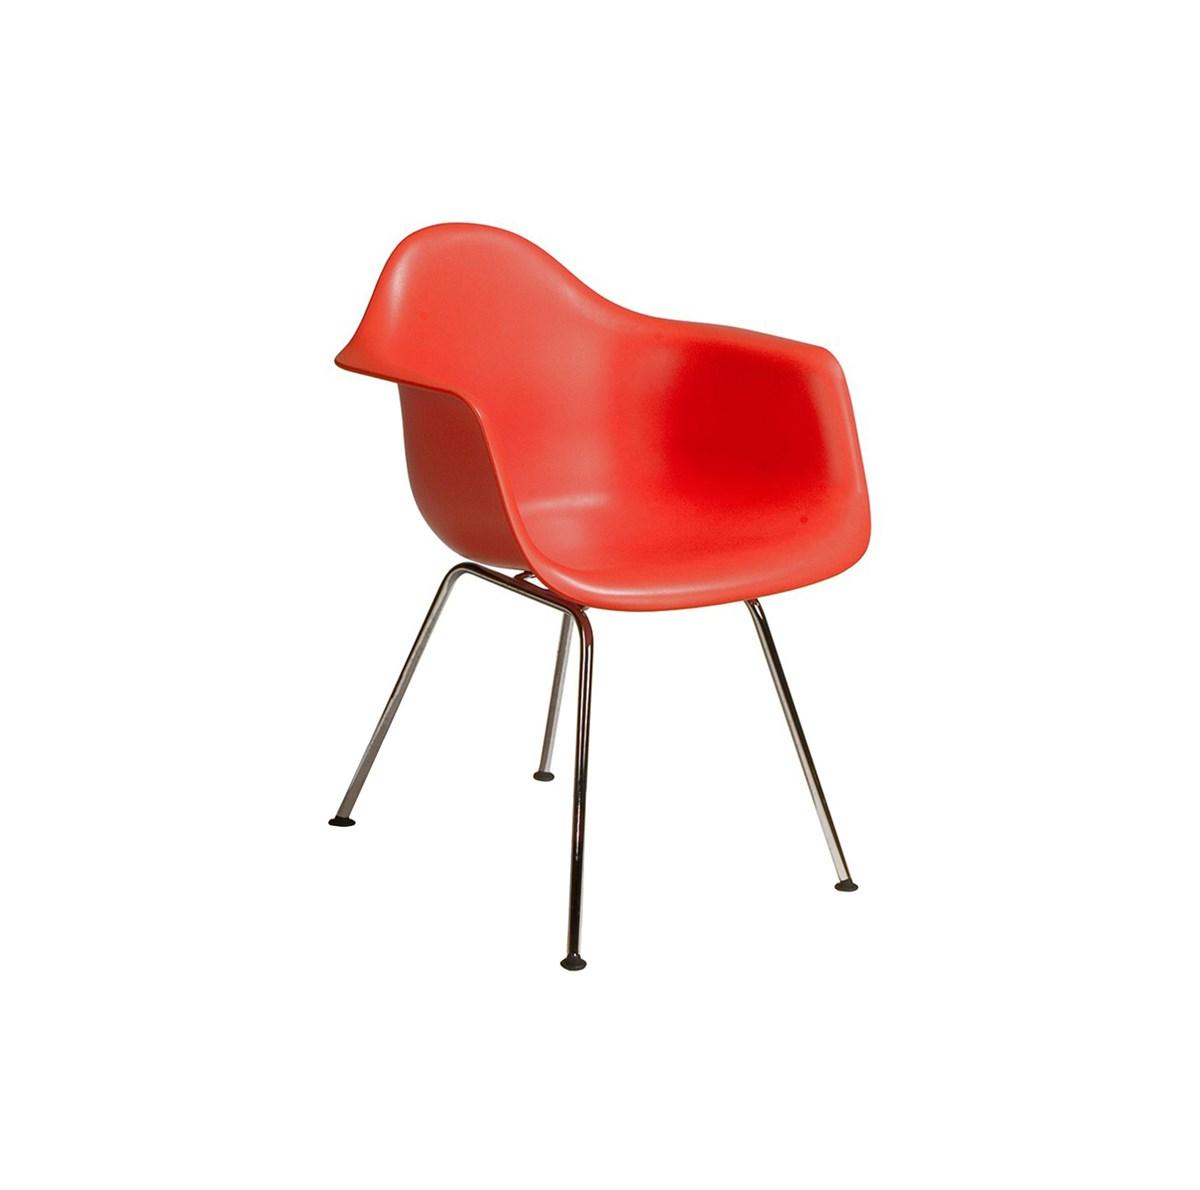 Herman-Miller-Charles-Ray-Eames-Eames®-DAX-Armchair-Matisse-1